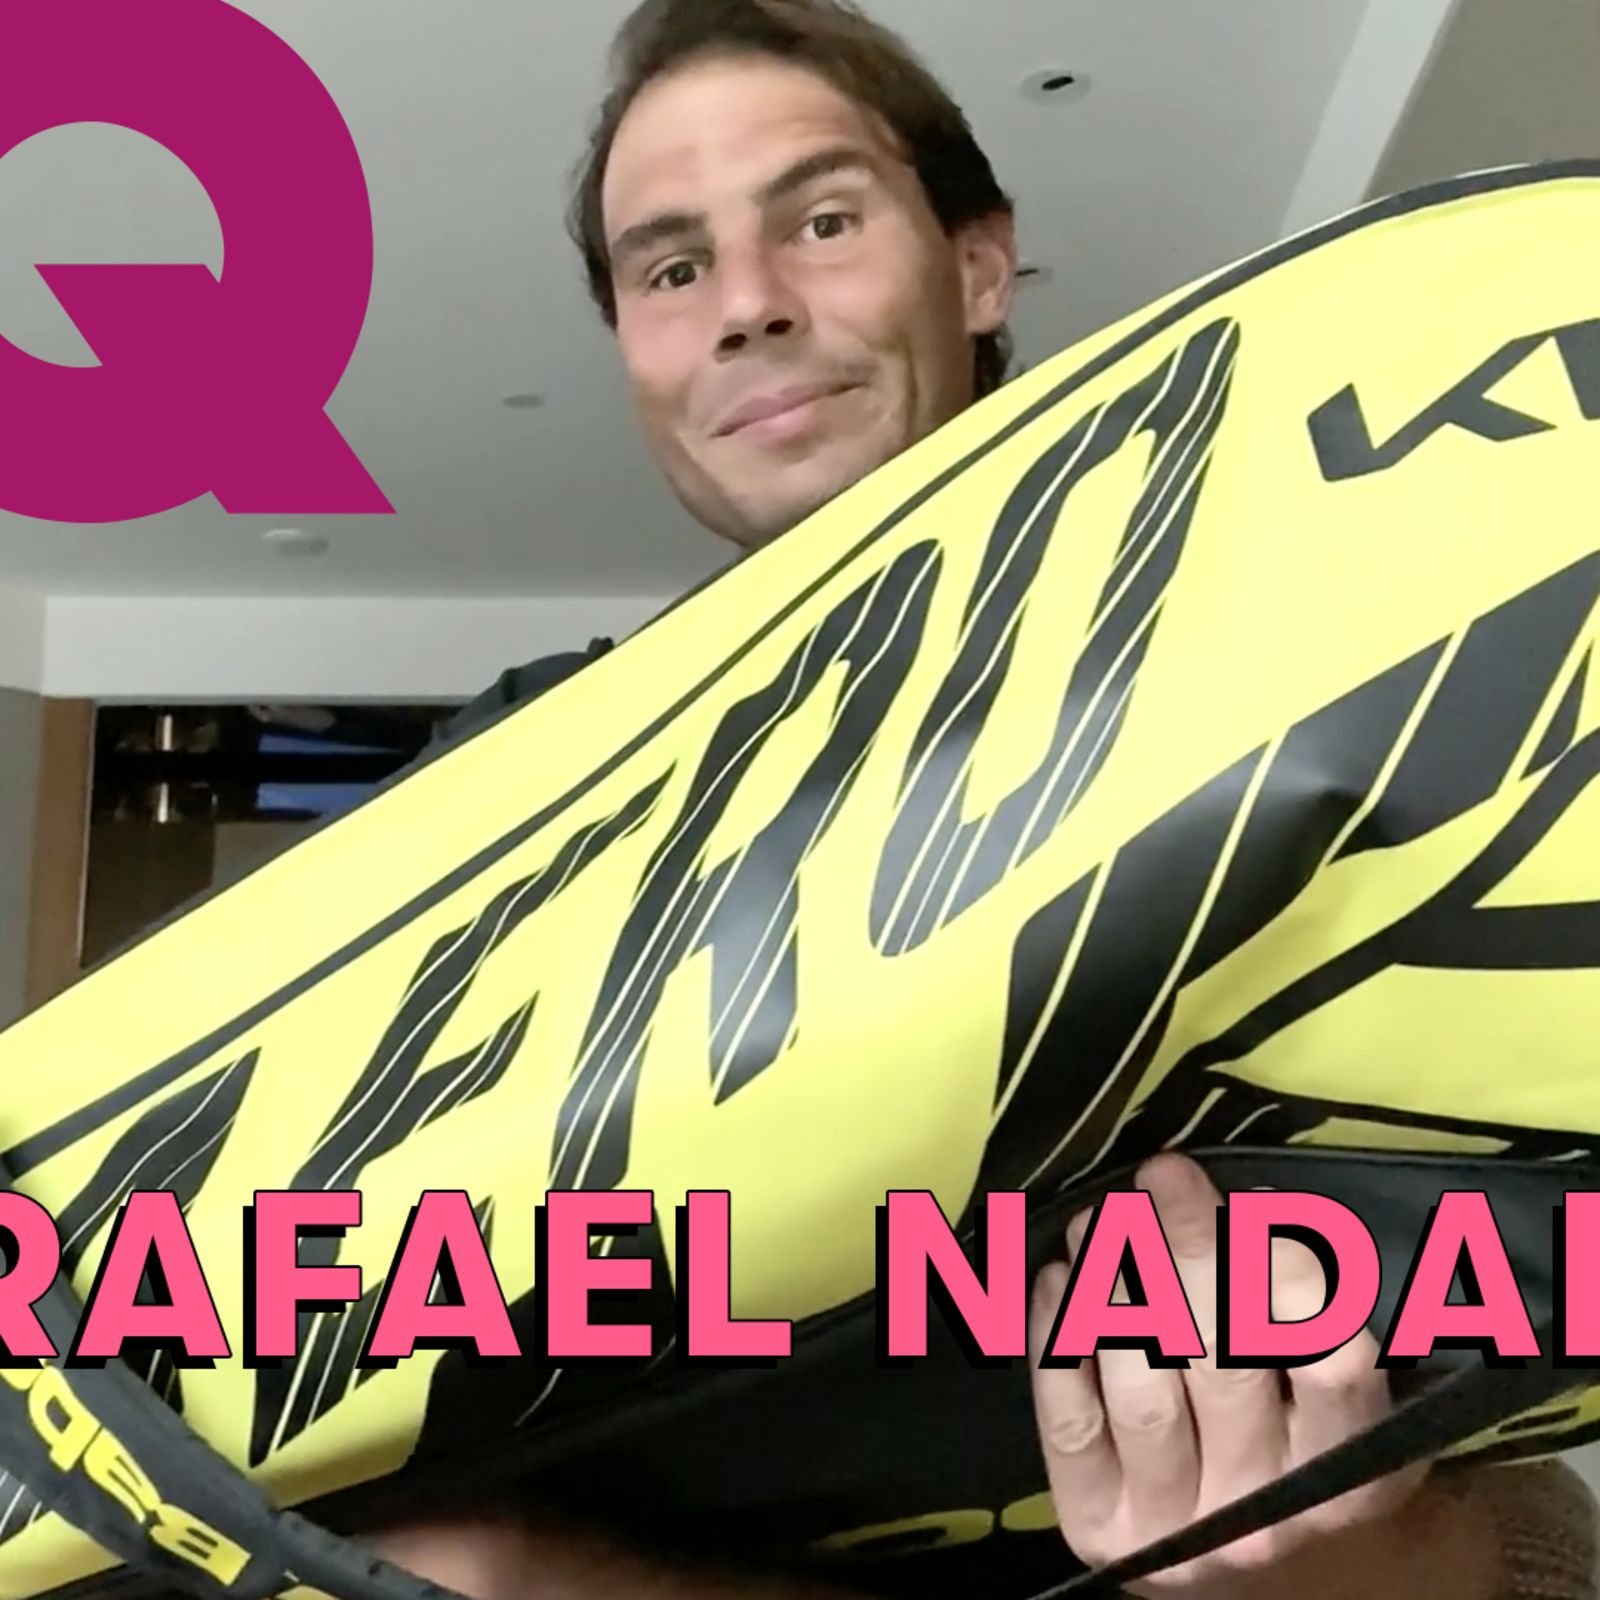 Les 10 Essentiels de Rafael Nadal (Raquette, Whatsapp, Masque)